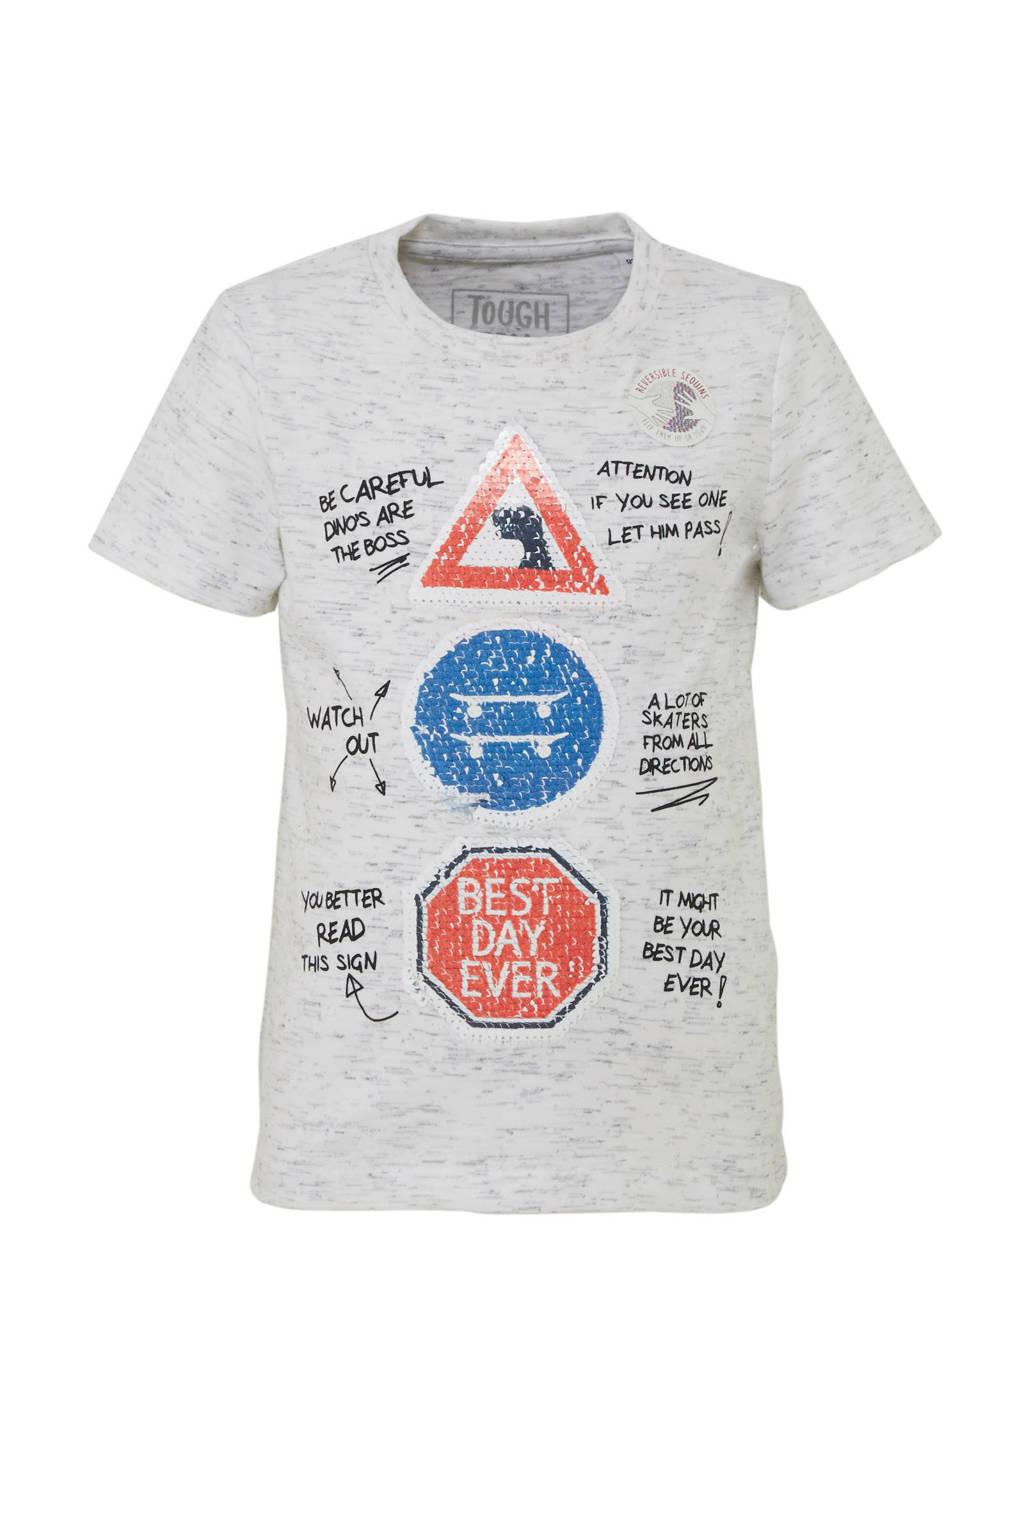 C&A Palomino T-shirt met tekst en pailletten lichtgrijs melange, Lichtgrijs melange